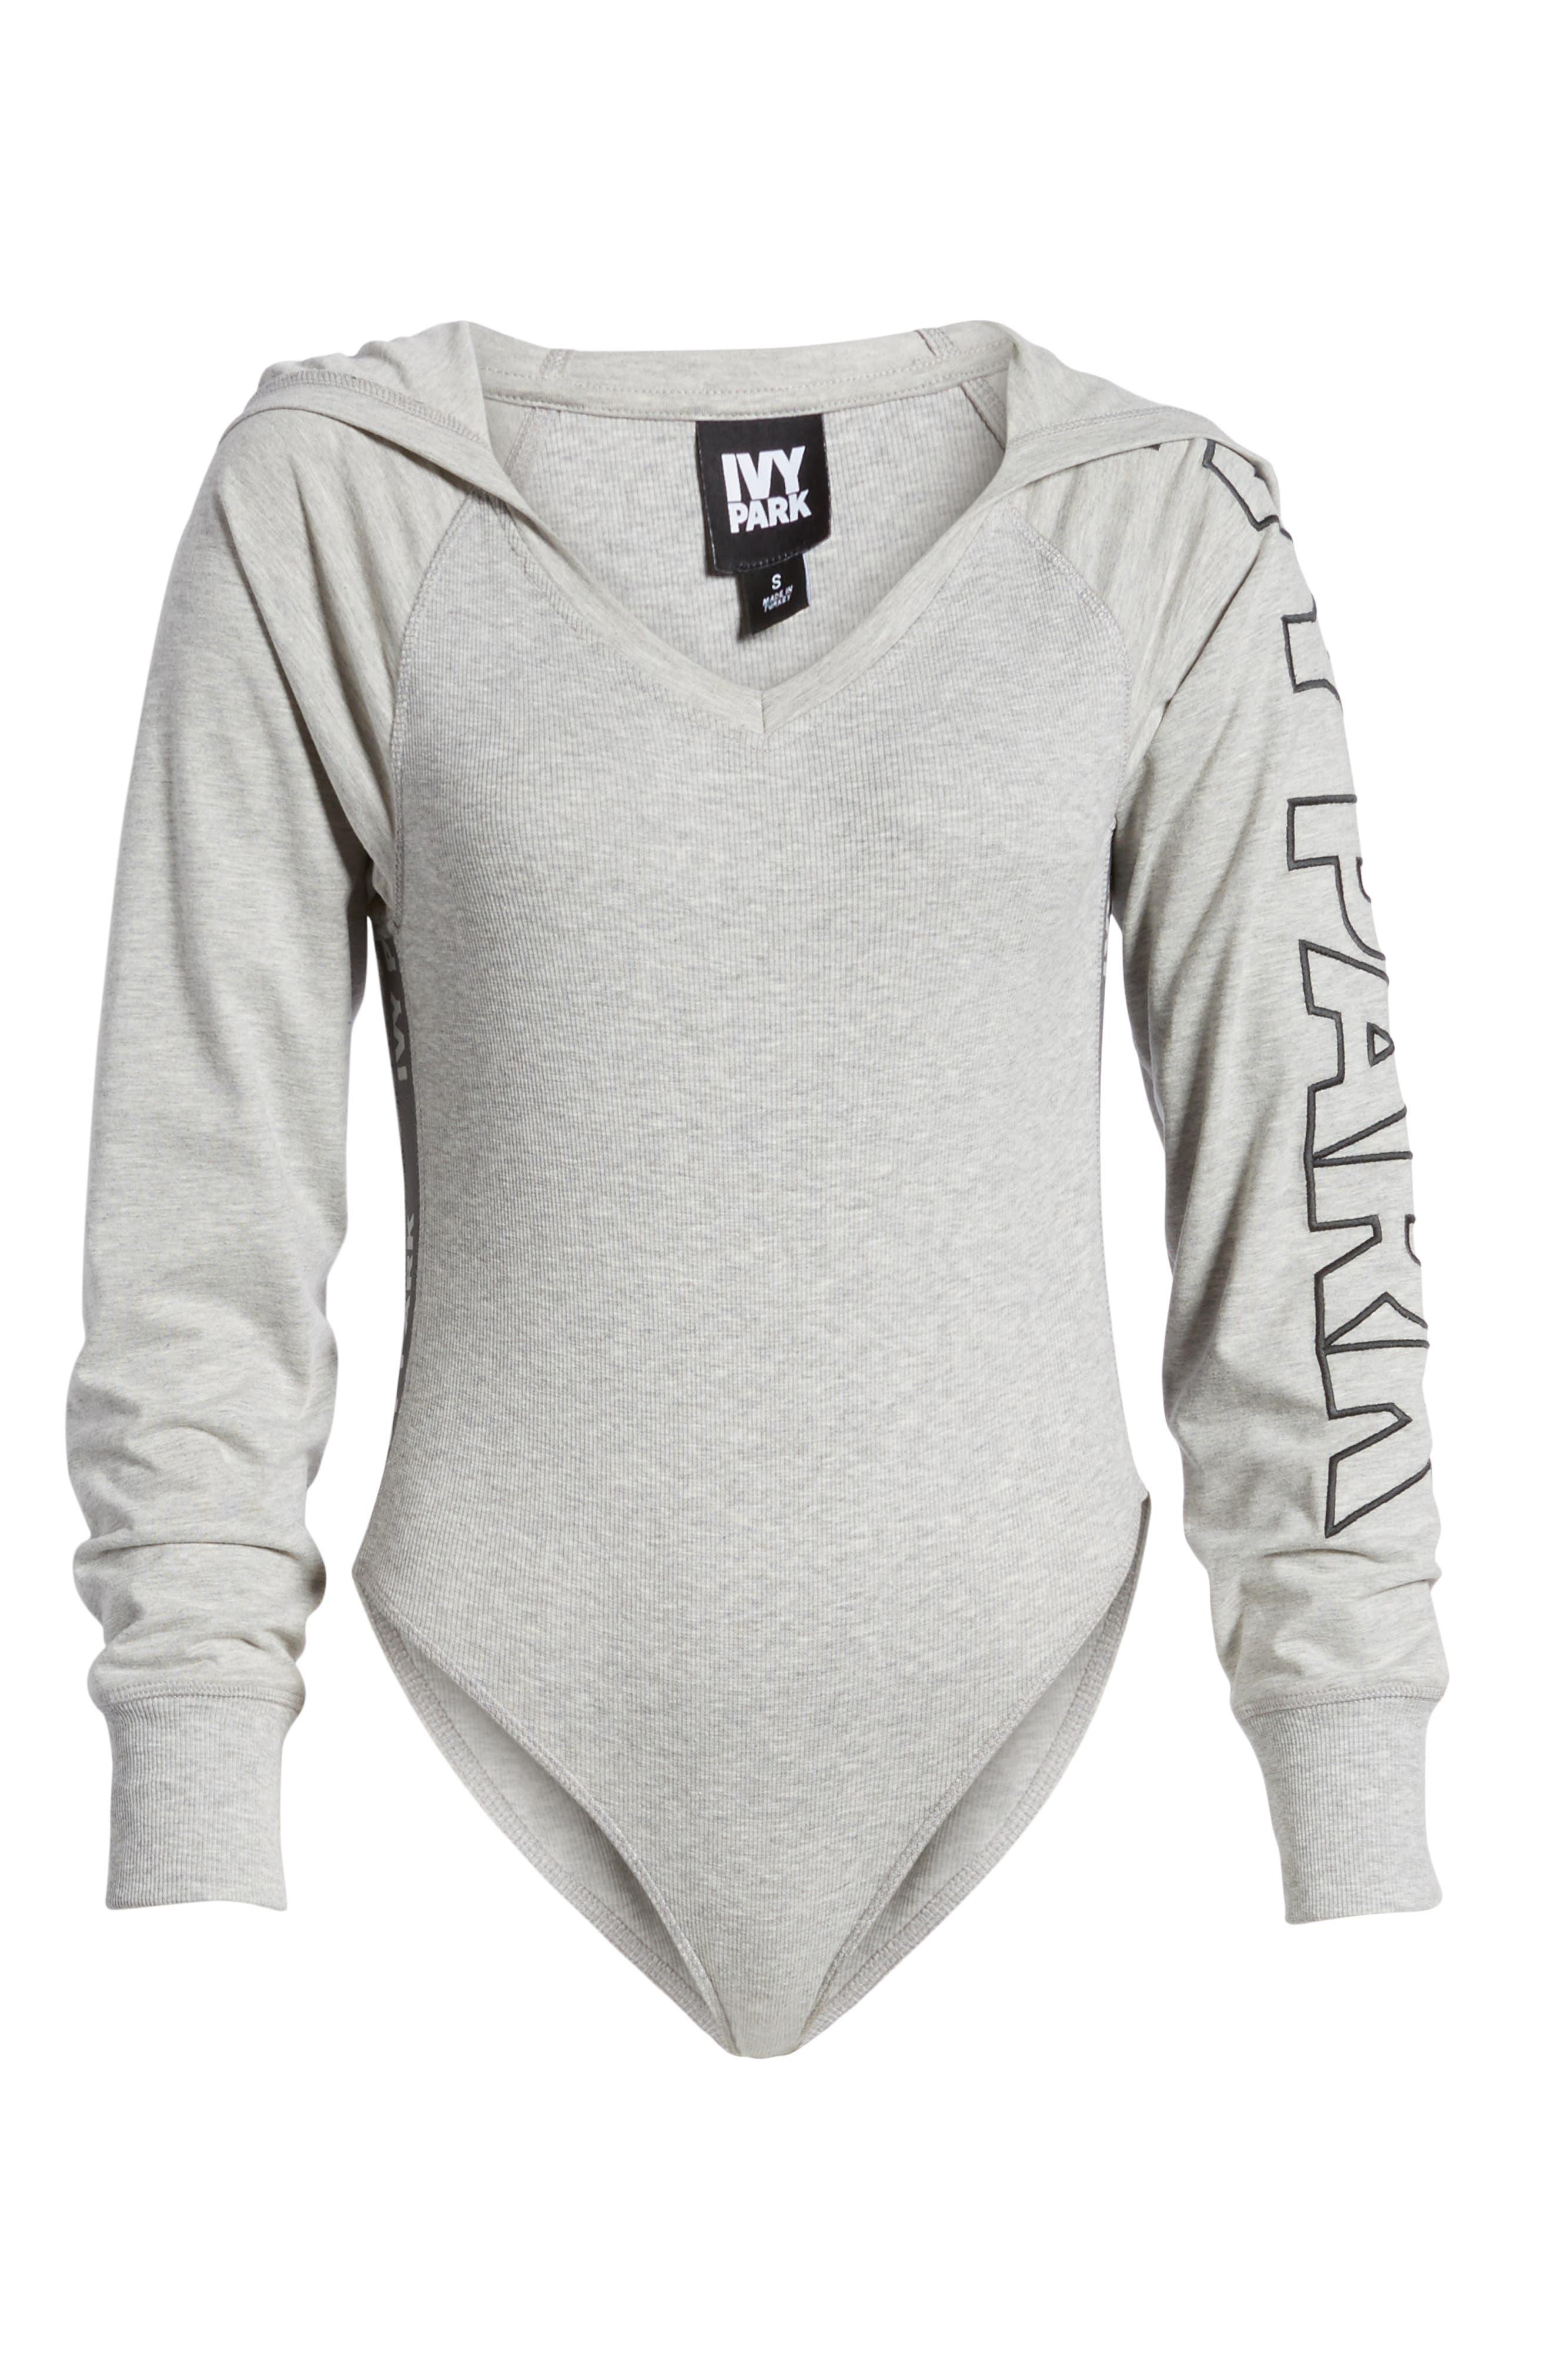 Alternate Image 1 Selected - IVY PARK® Hooded Bodysuit